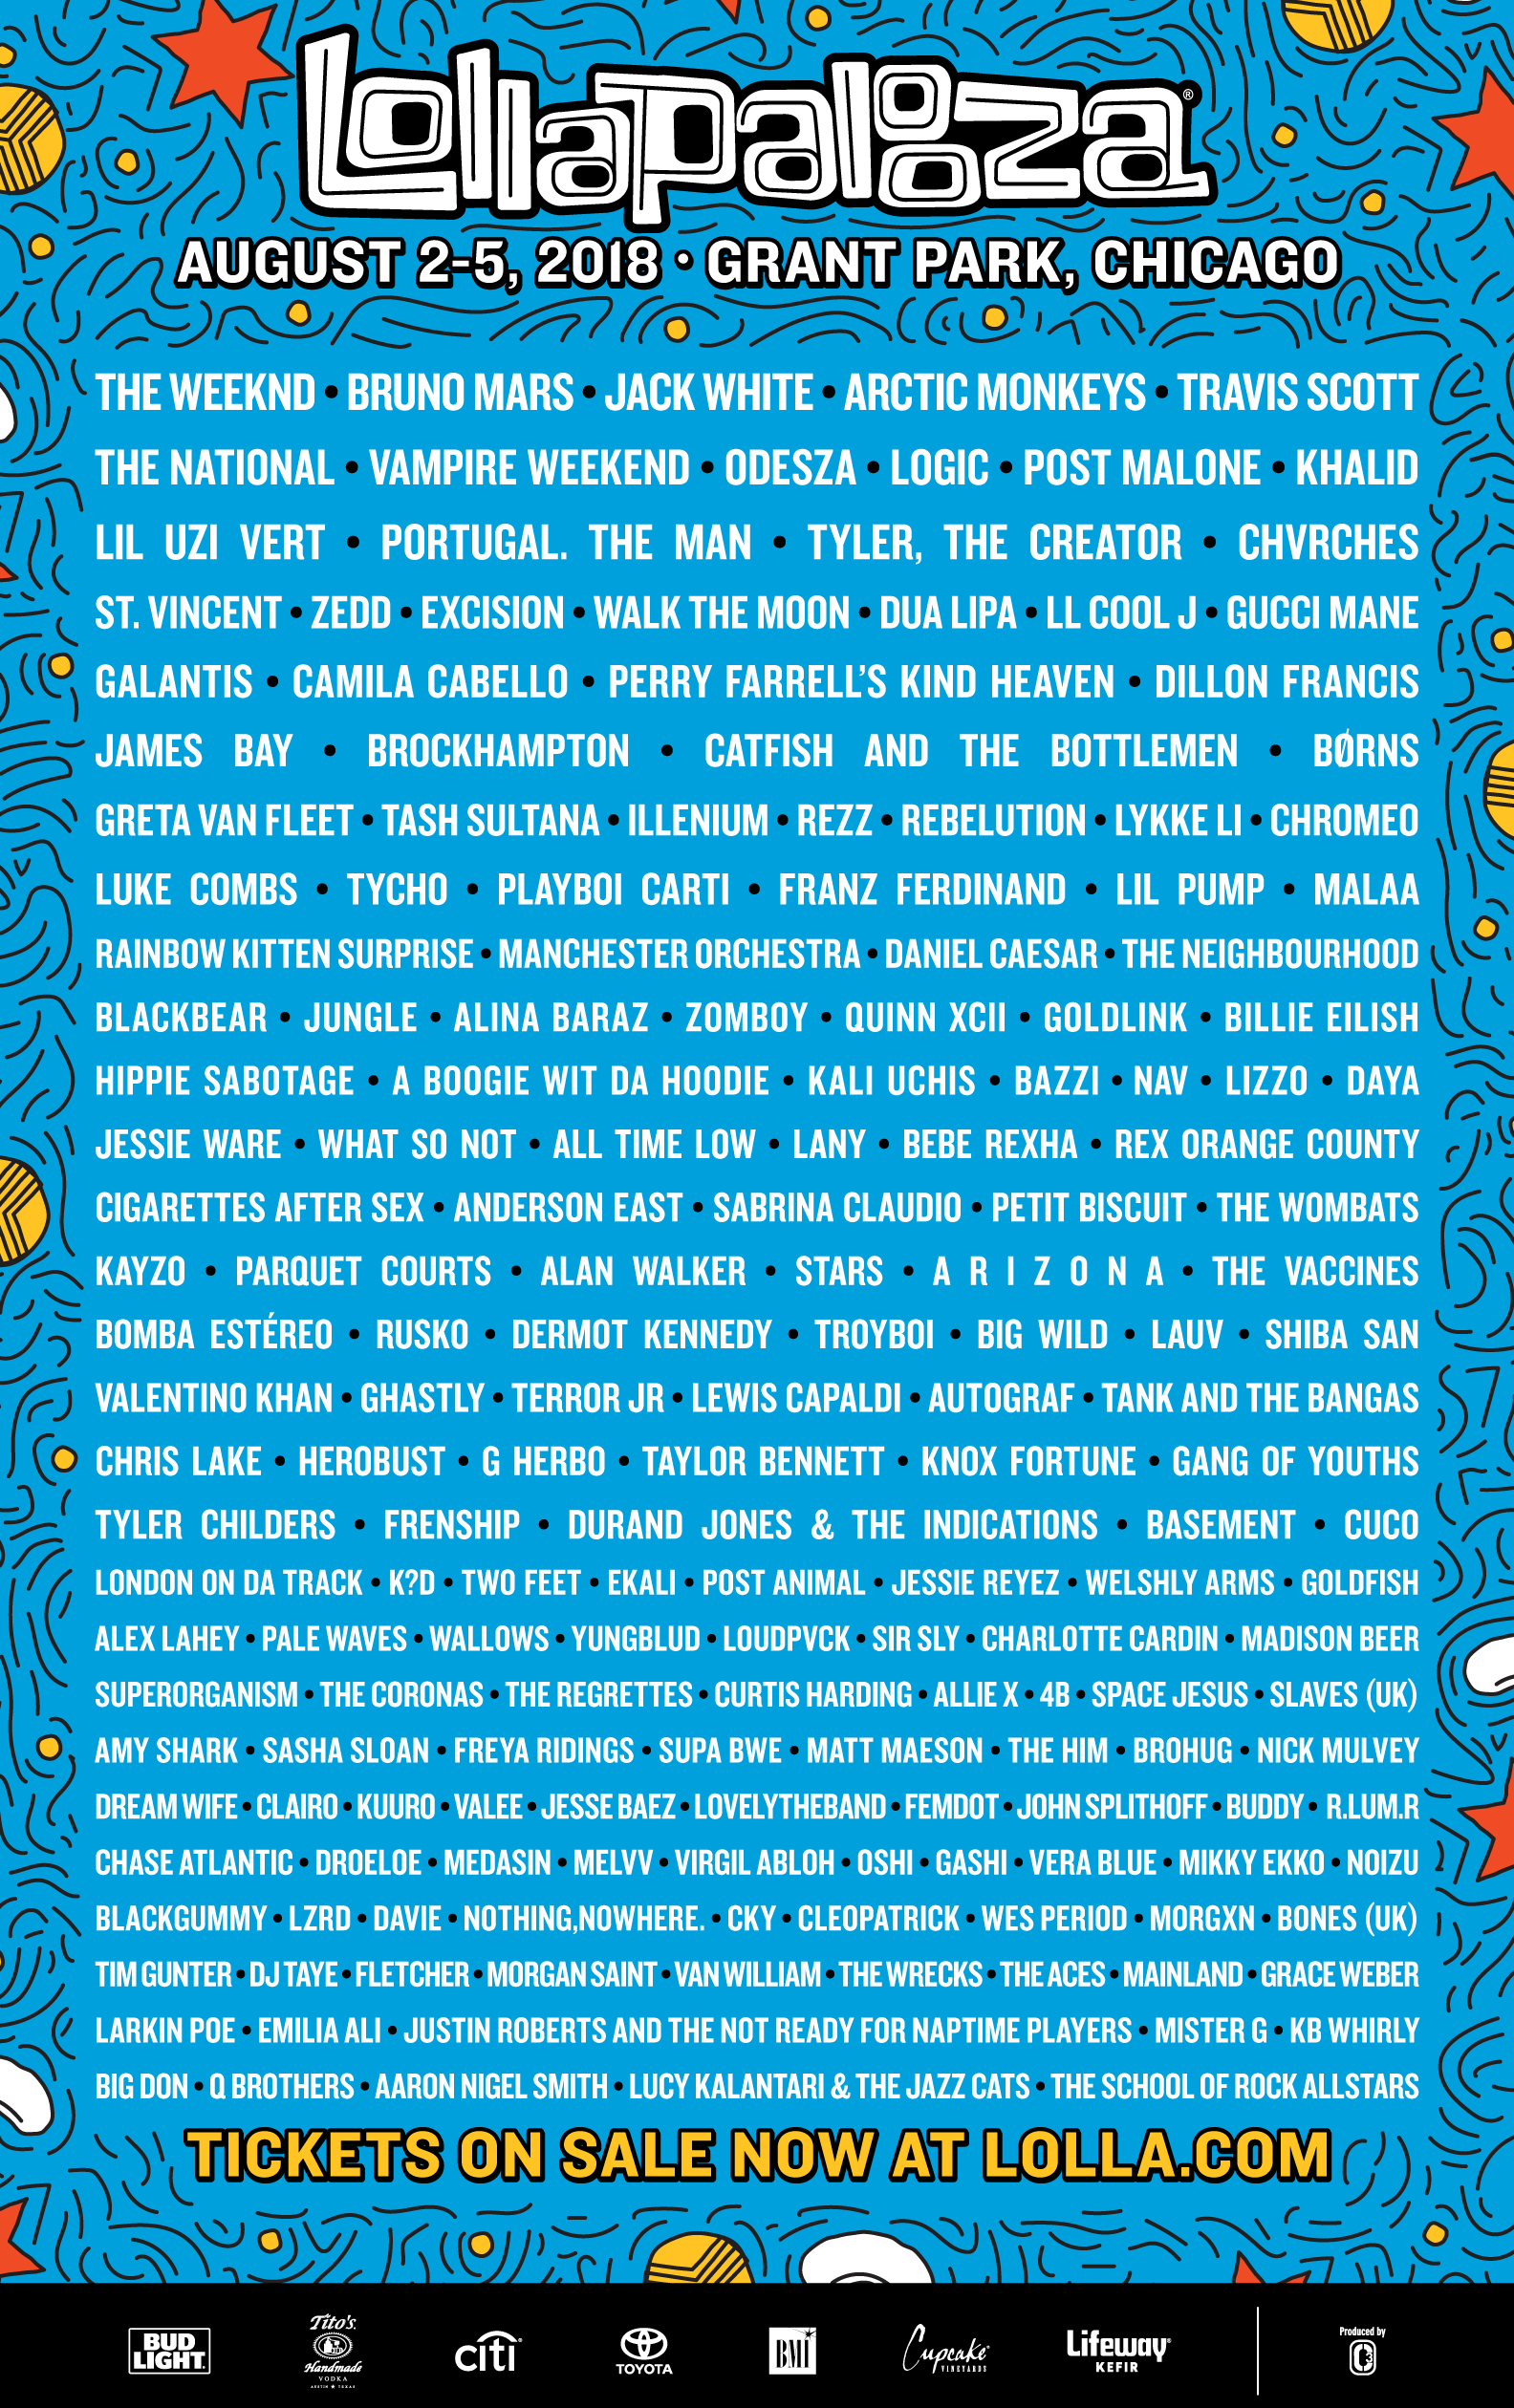 Travis Scott, Logic, LL Cool J & More Announced For Lollapalooza 2018